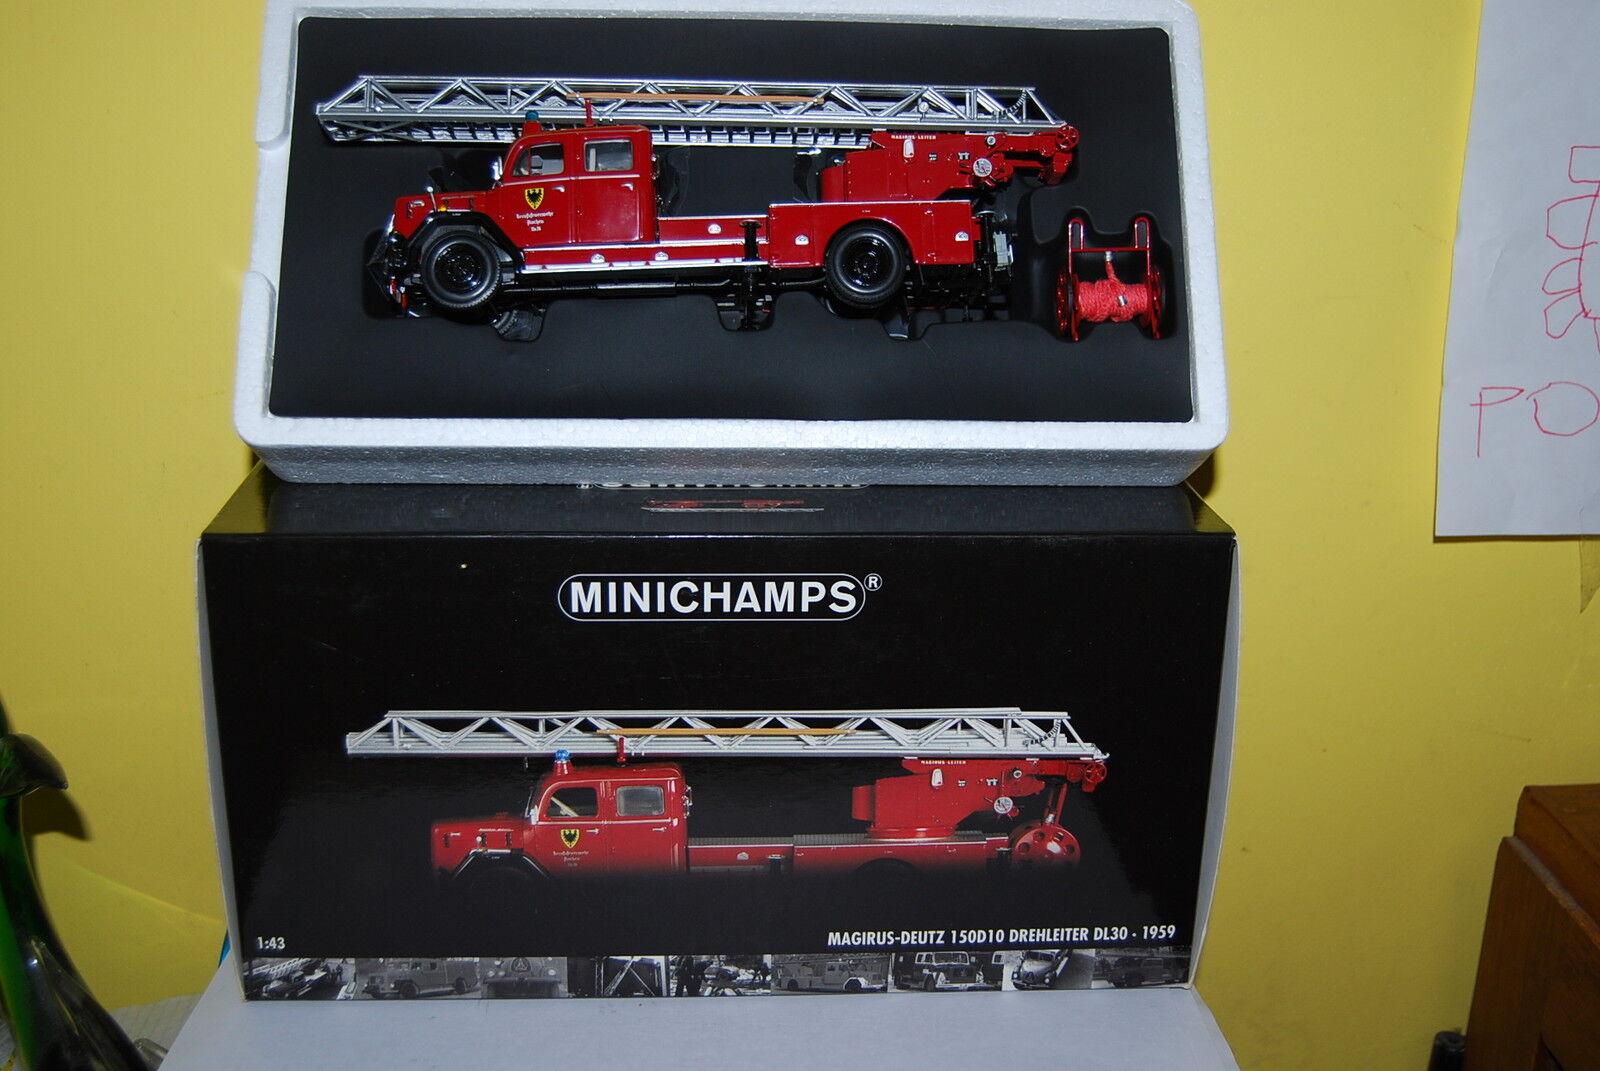 MINICHAMPS MAGIRUS DEUTZ 150D10 DREHLEITER DL30 DE1959 NEUF BOITE NEW BOX